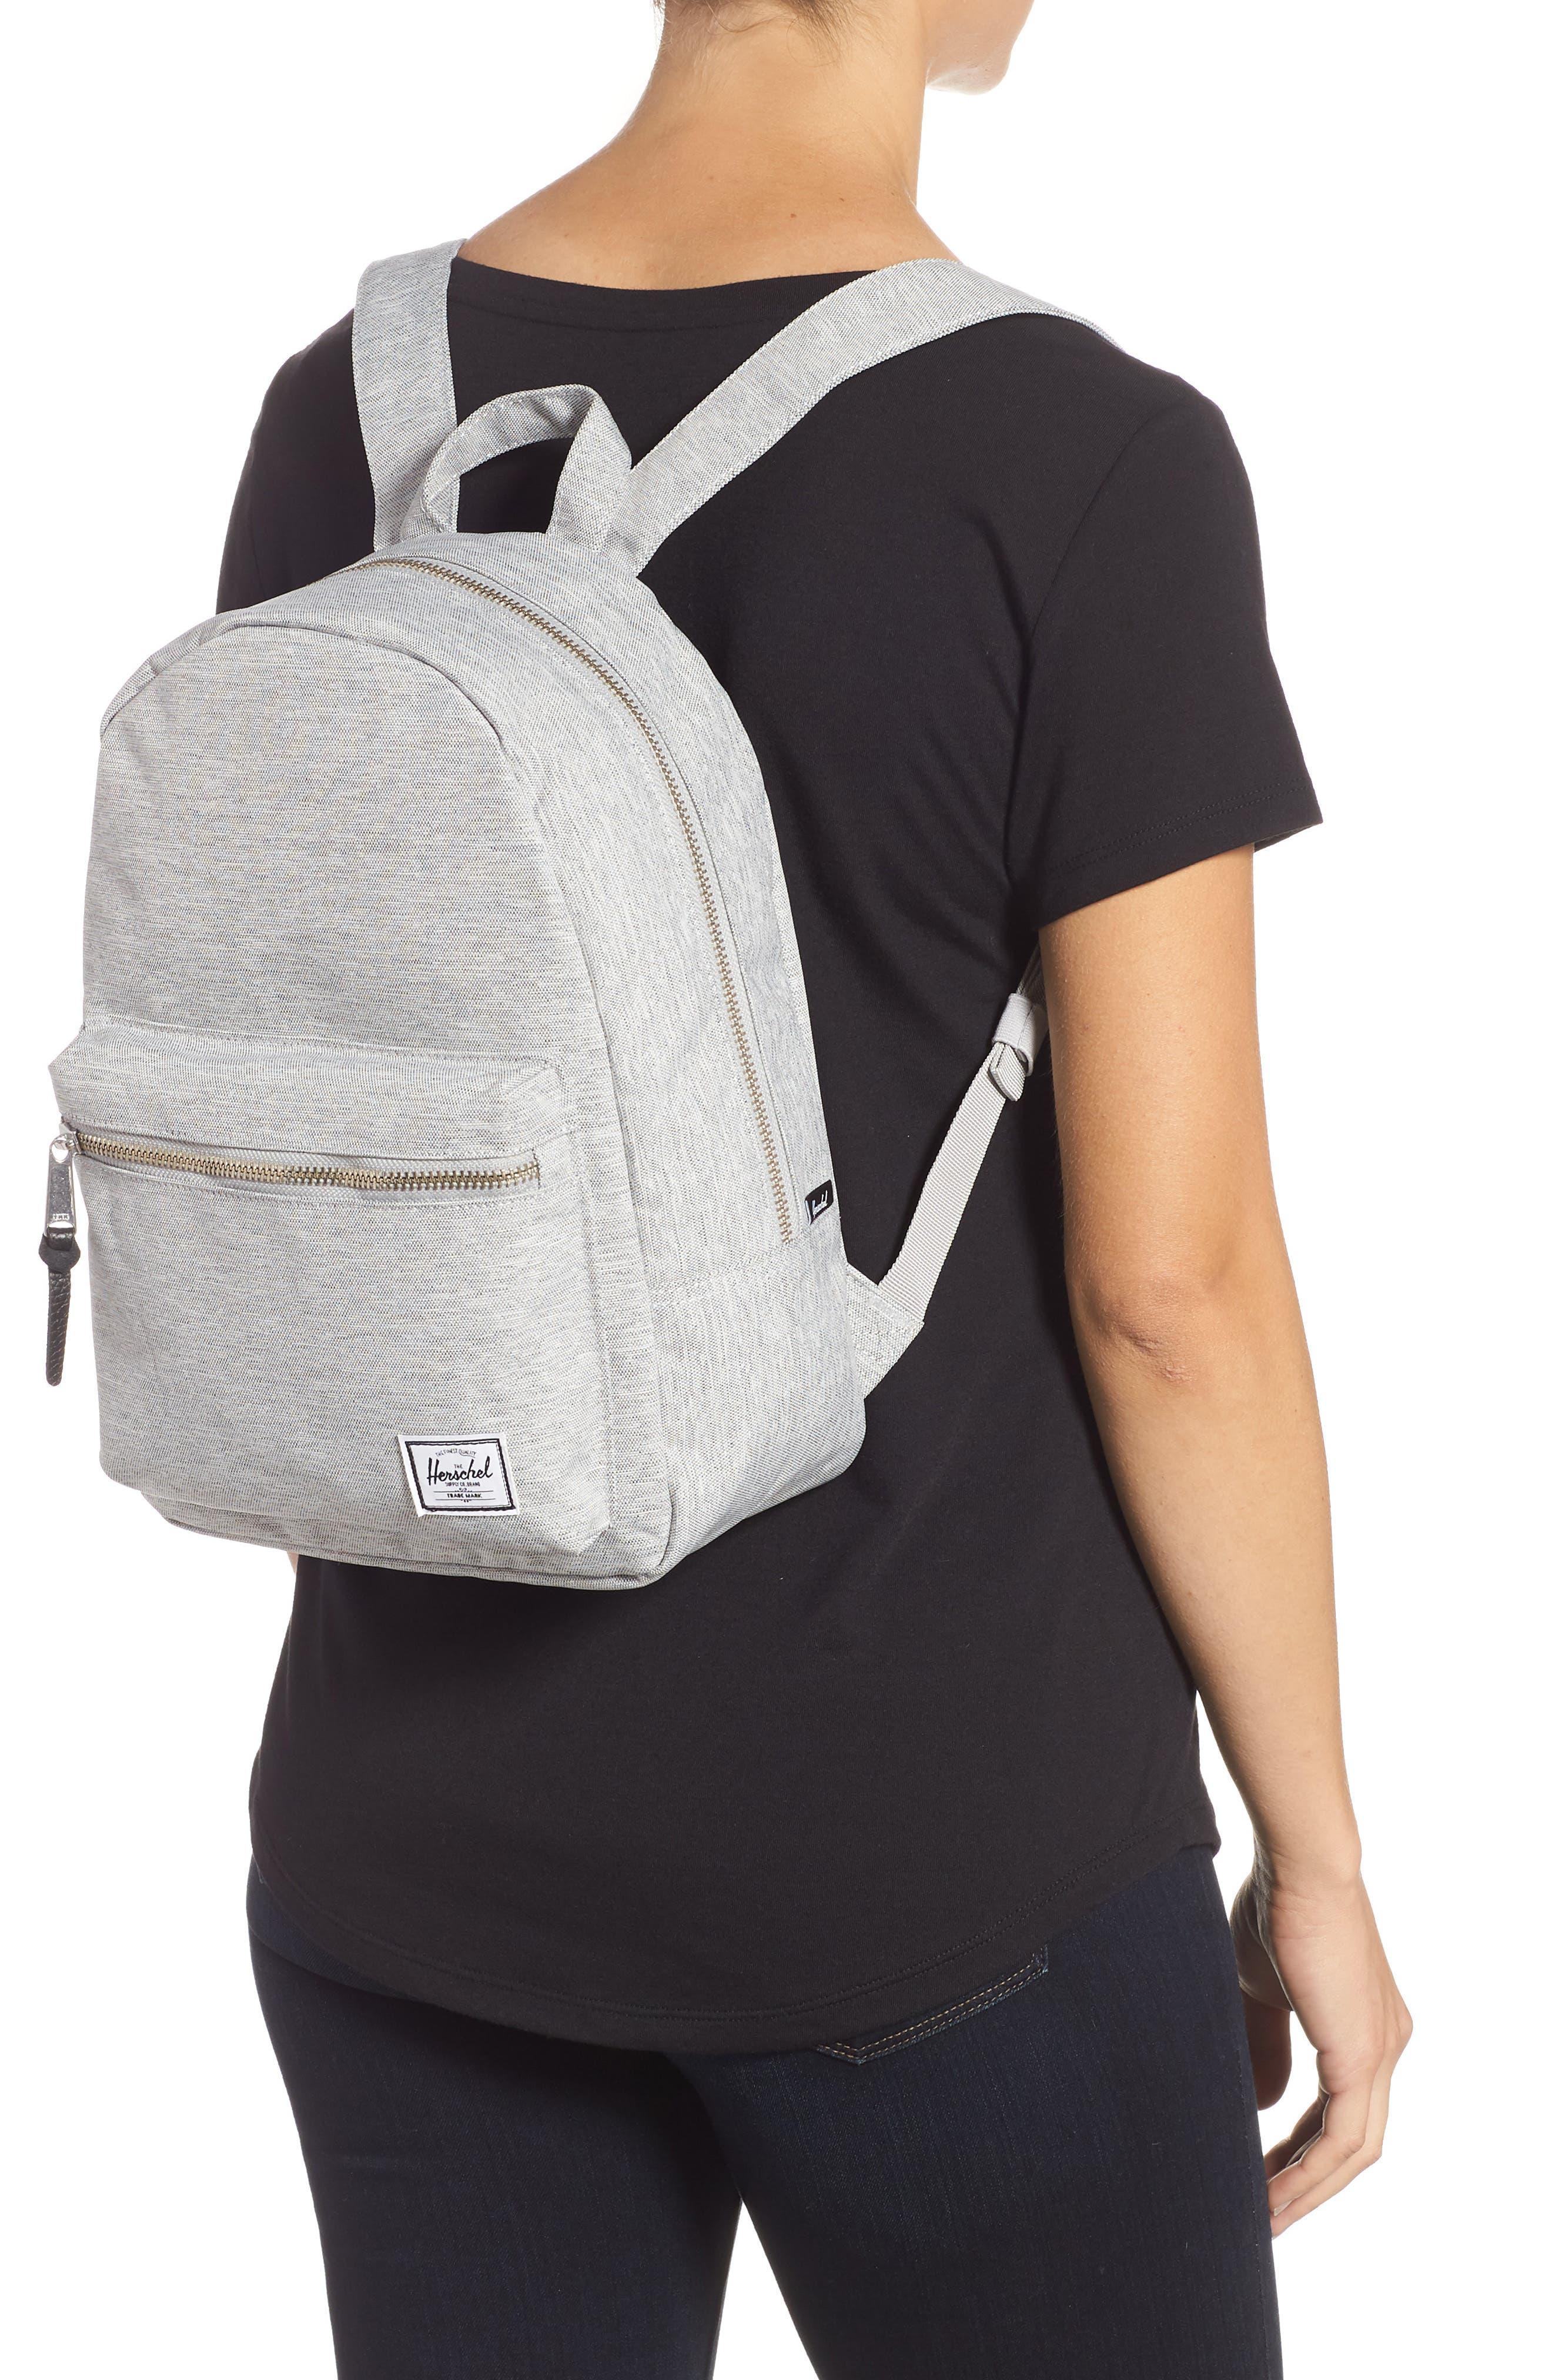 Grove Backpack,                             Alternate thumbnail 2, color,                             LIGHT GREY CROSSHATCH